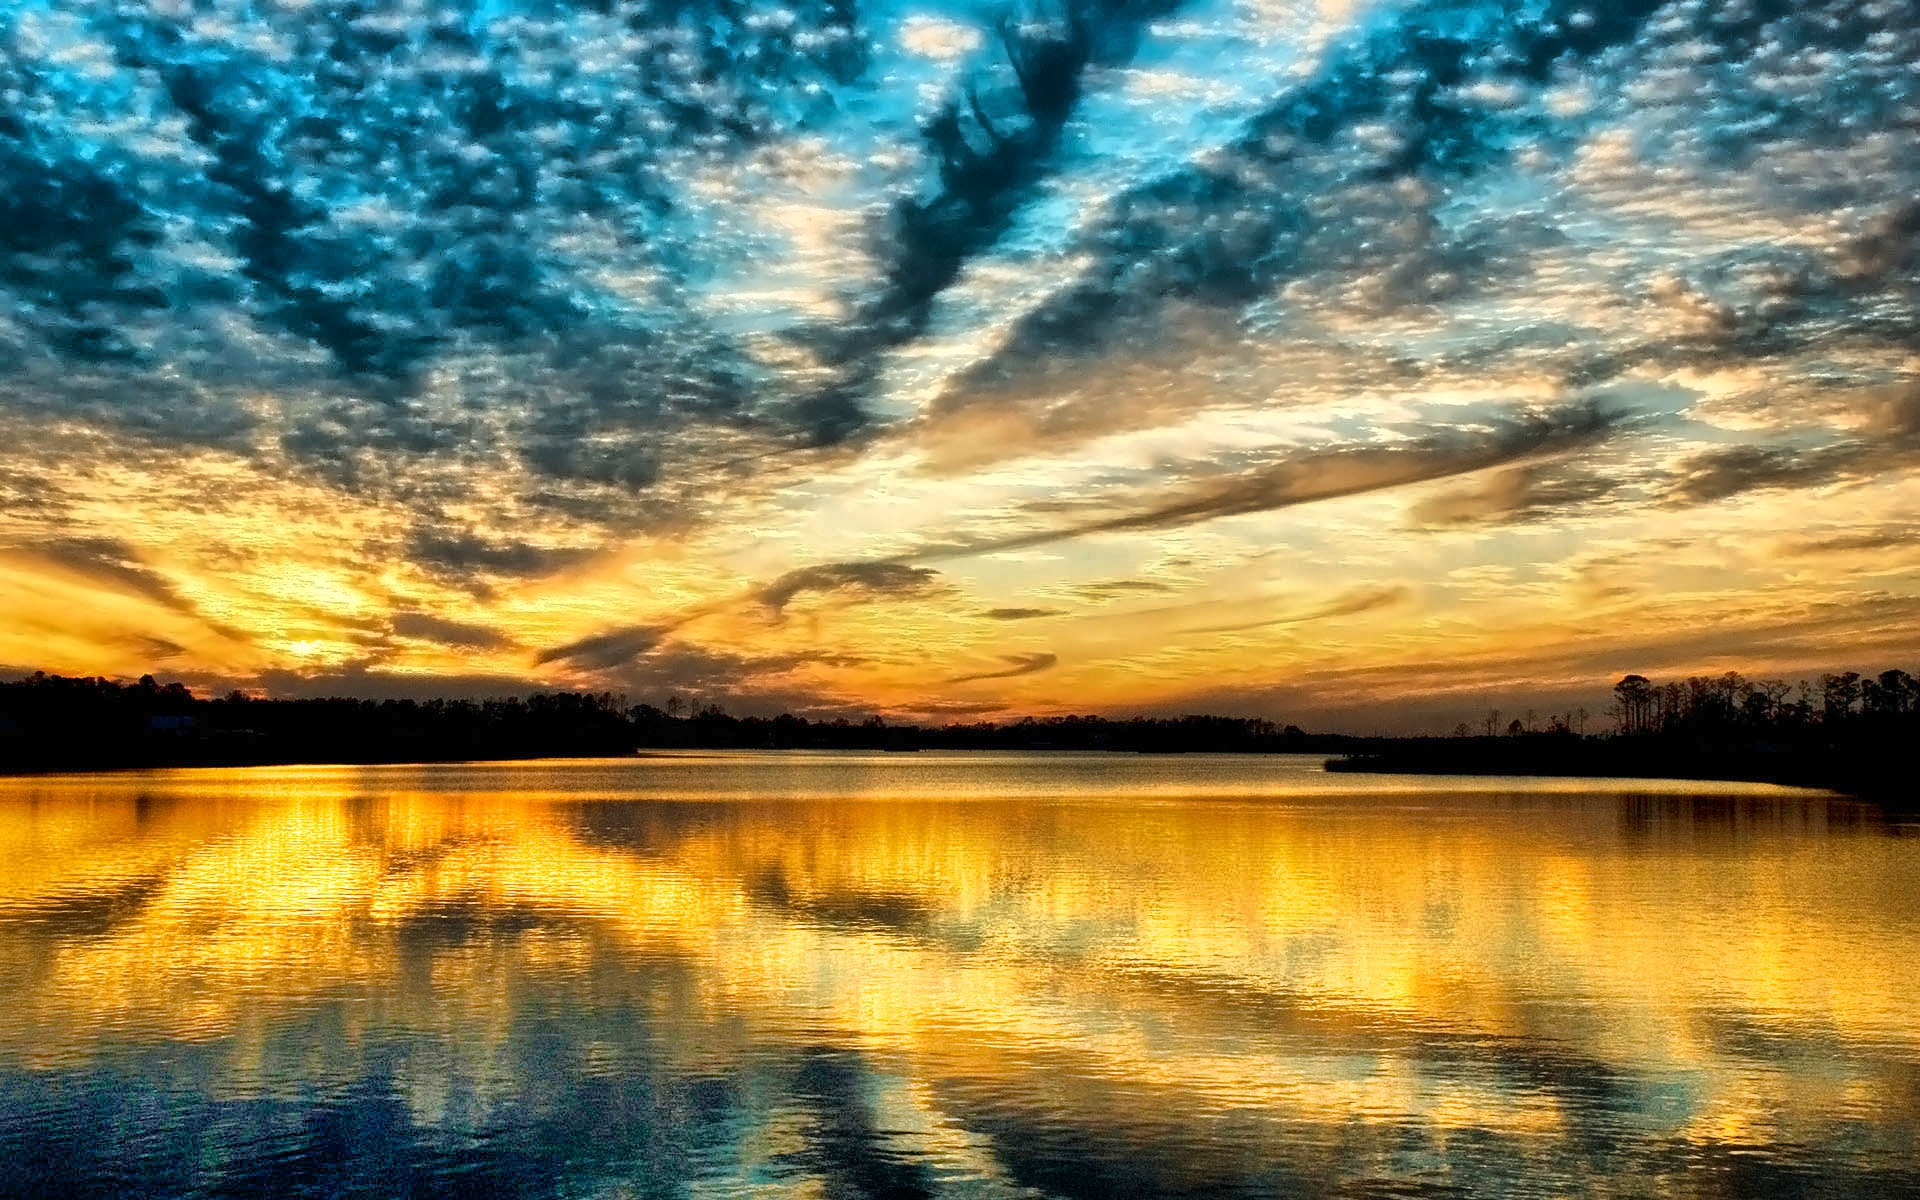 Beautiful Sky Wallpaper Landscape Nature Wallpapers in jpg format ...